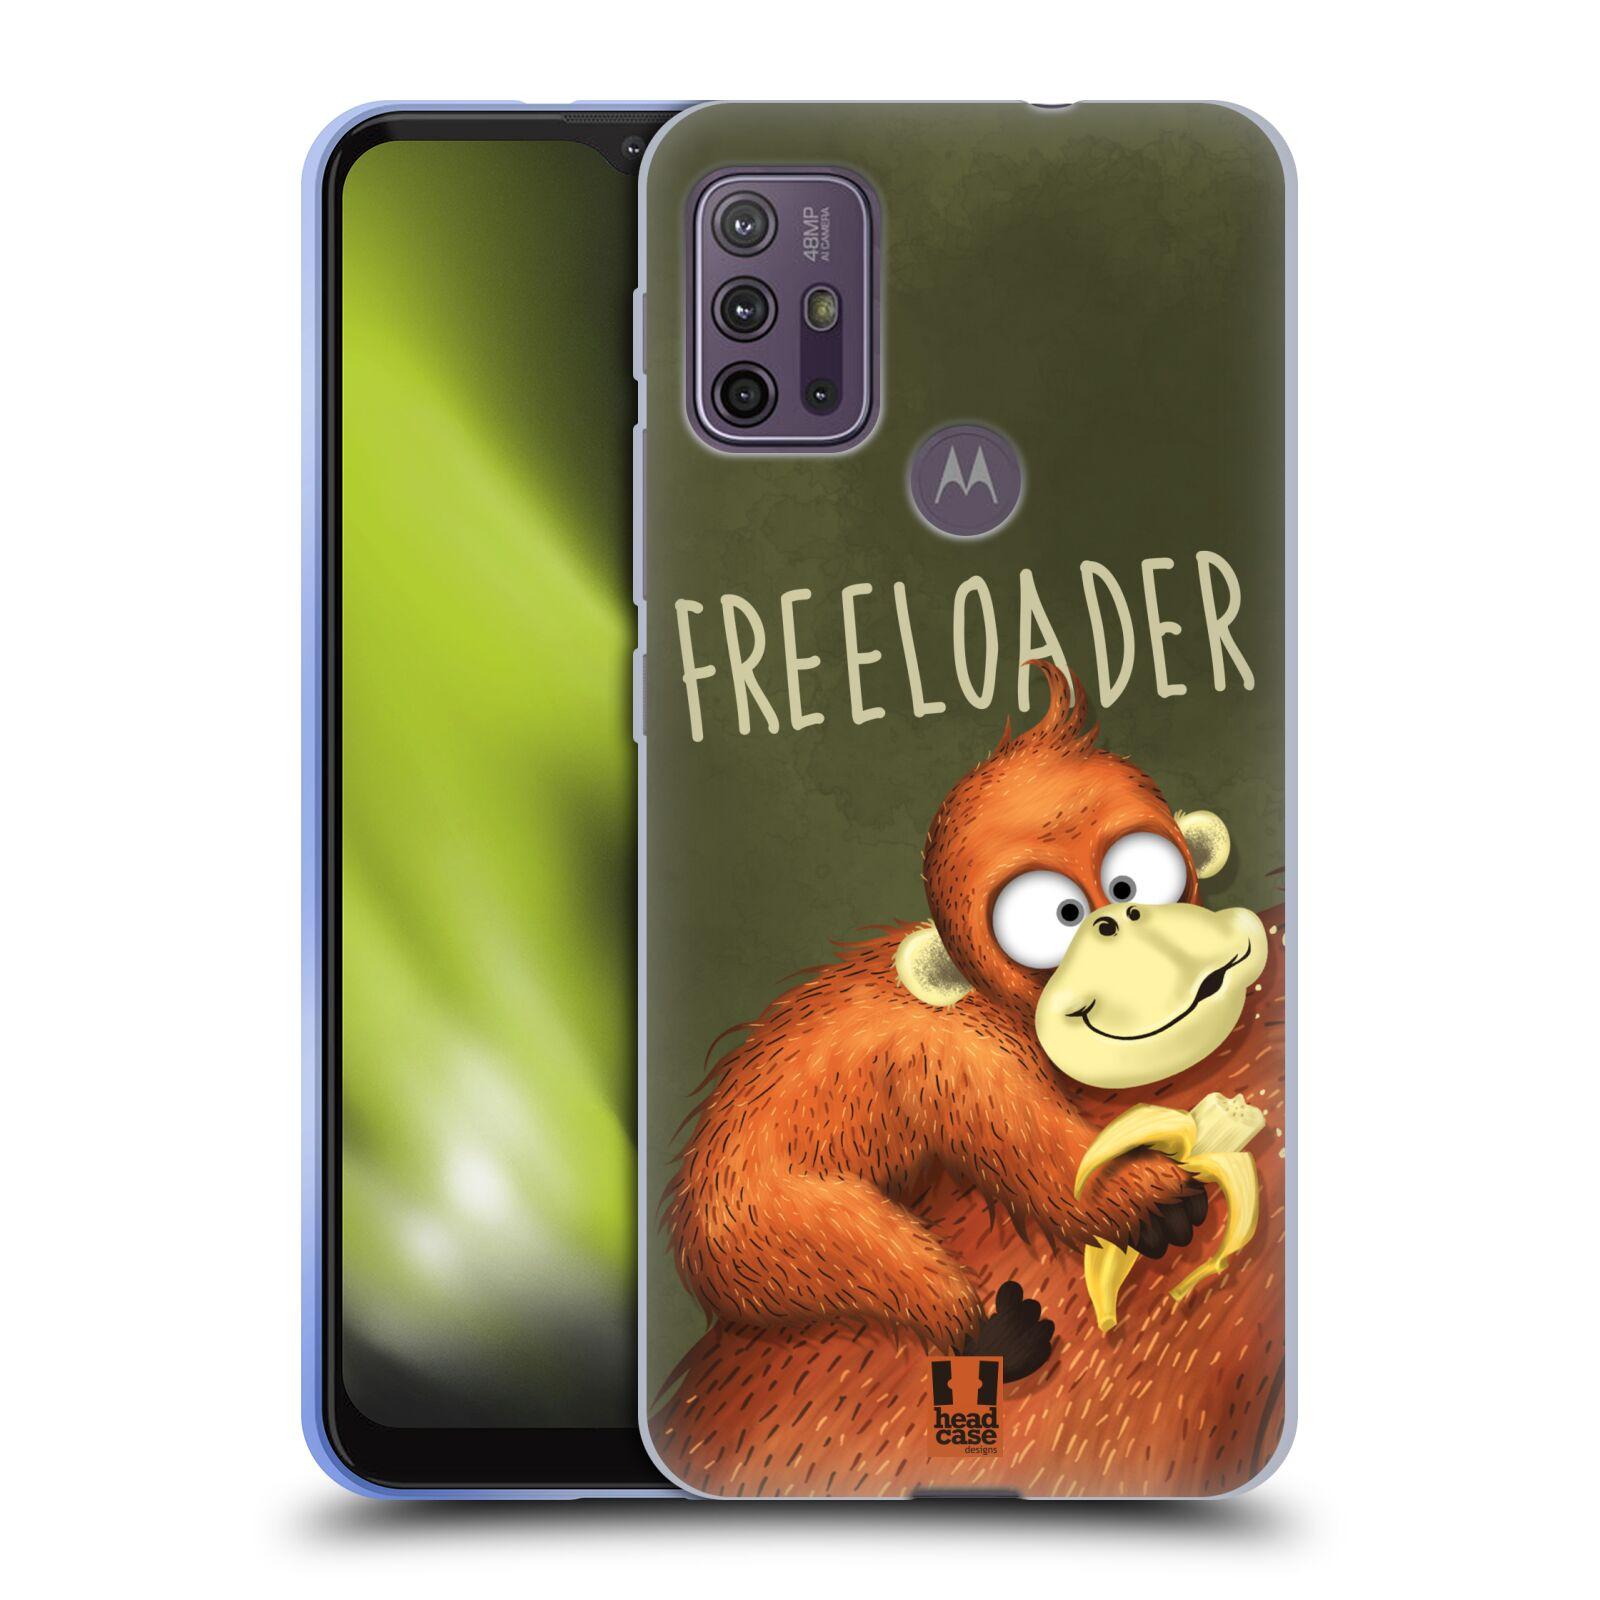 Silikonové pouzdro na mobil Motorola Moto G10 / G30 - Head Case - Opičák Freeloader